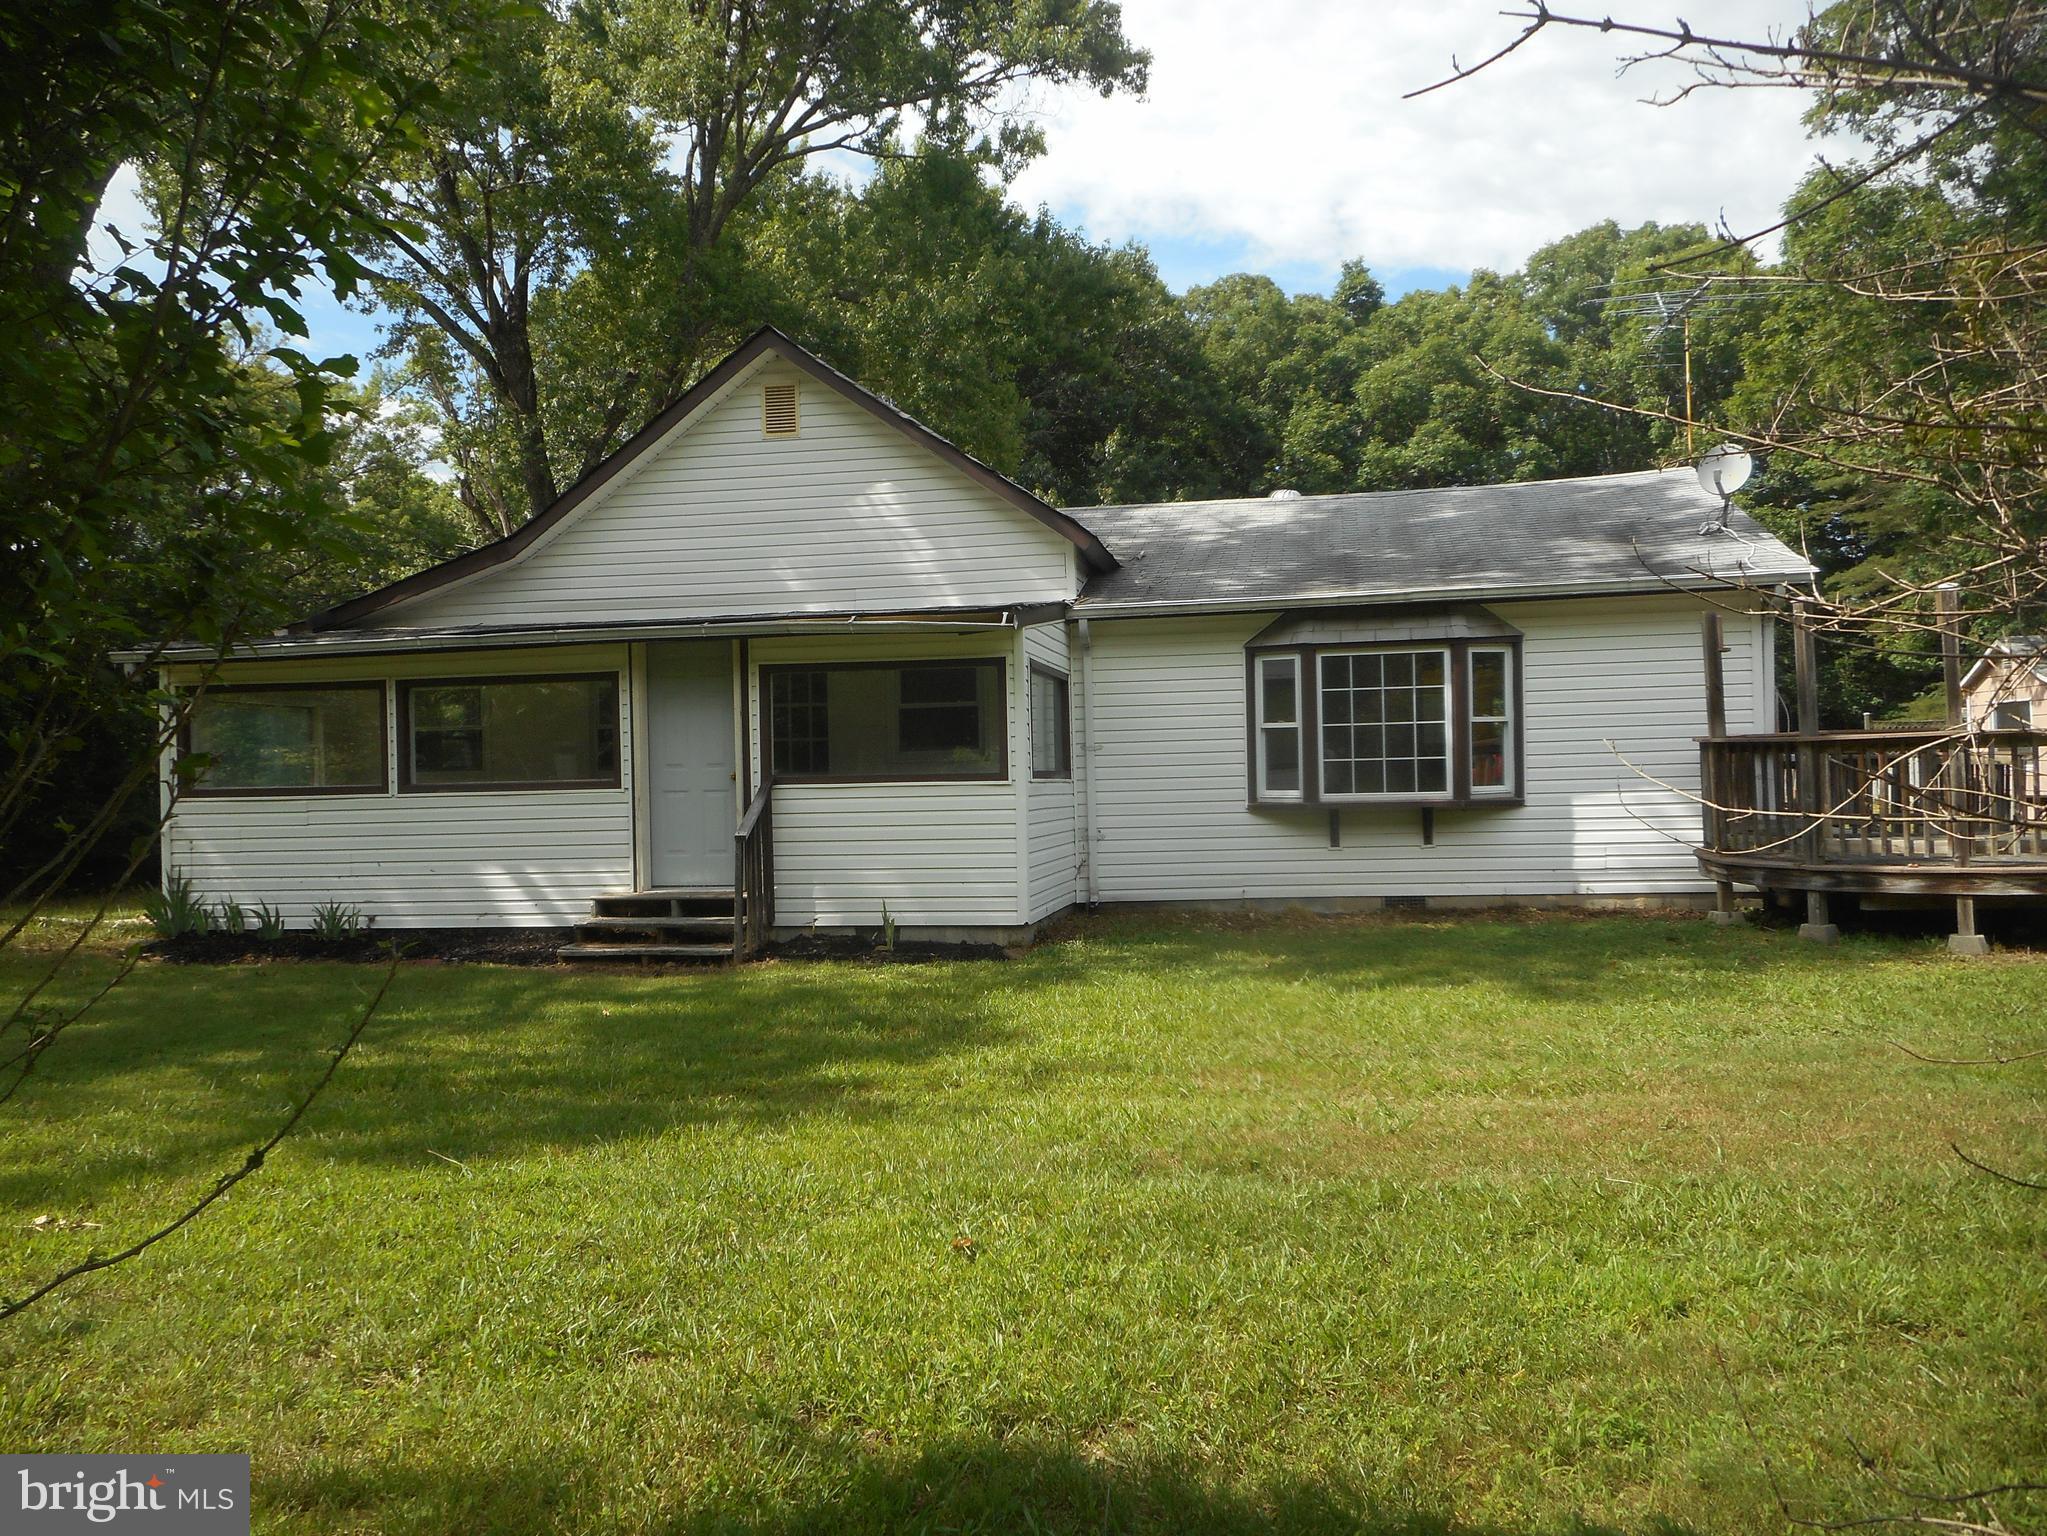 2370 Smith Point Rd, Nanjemoy, MD, 20662